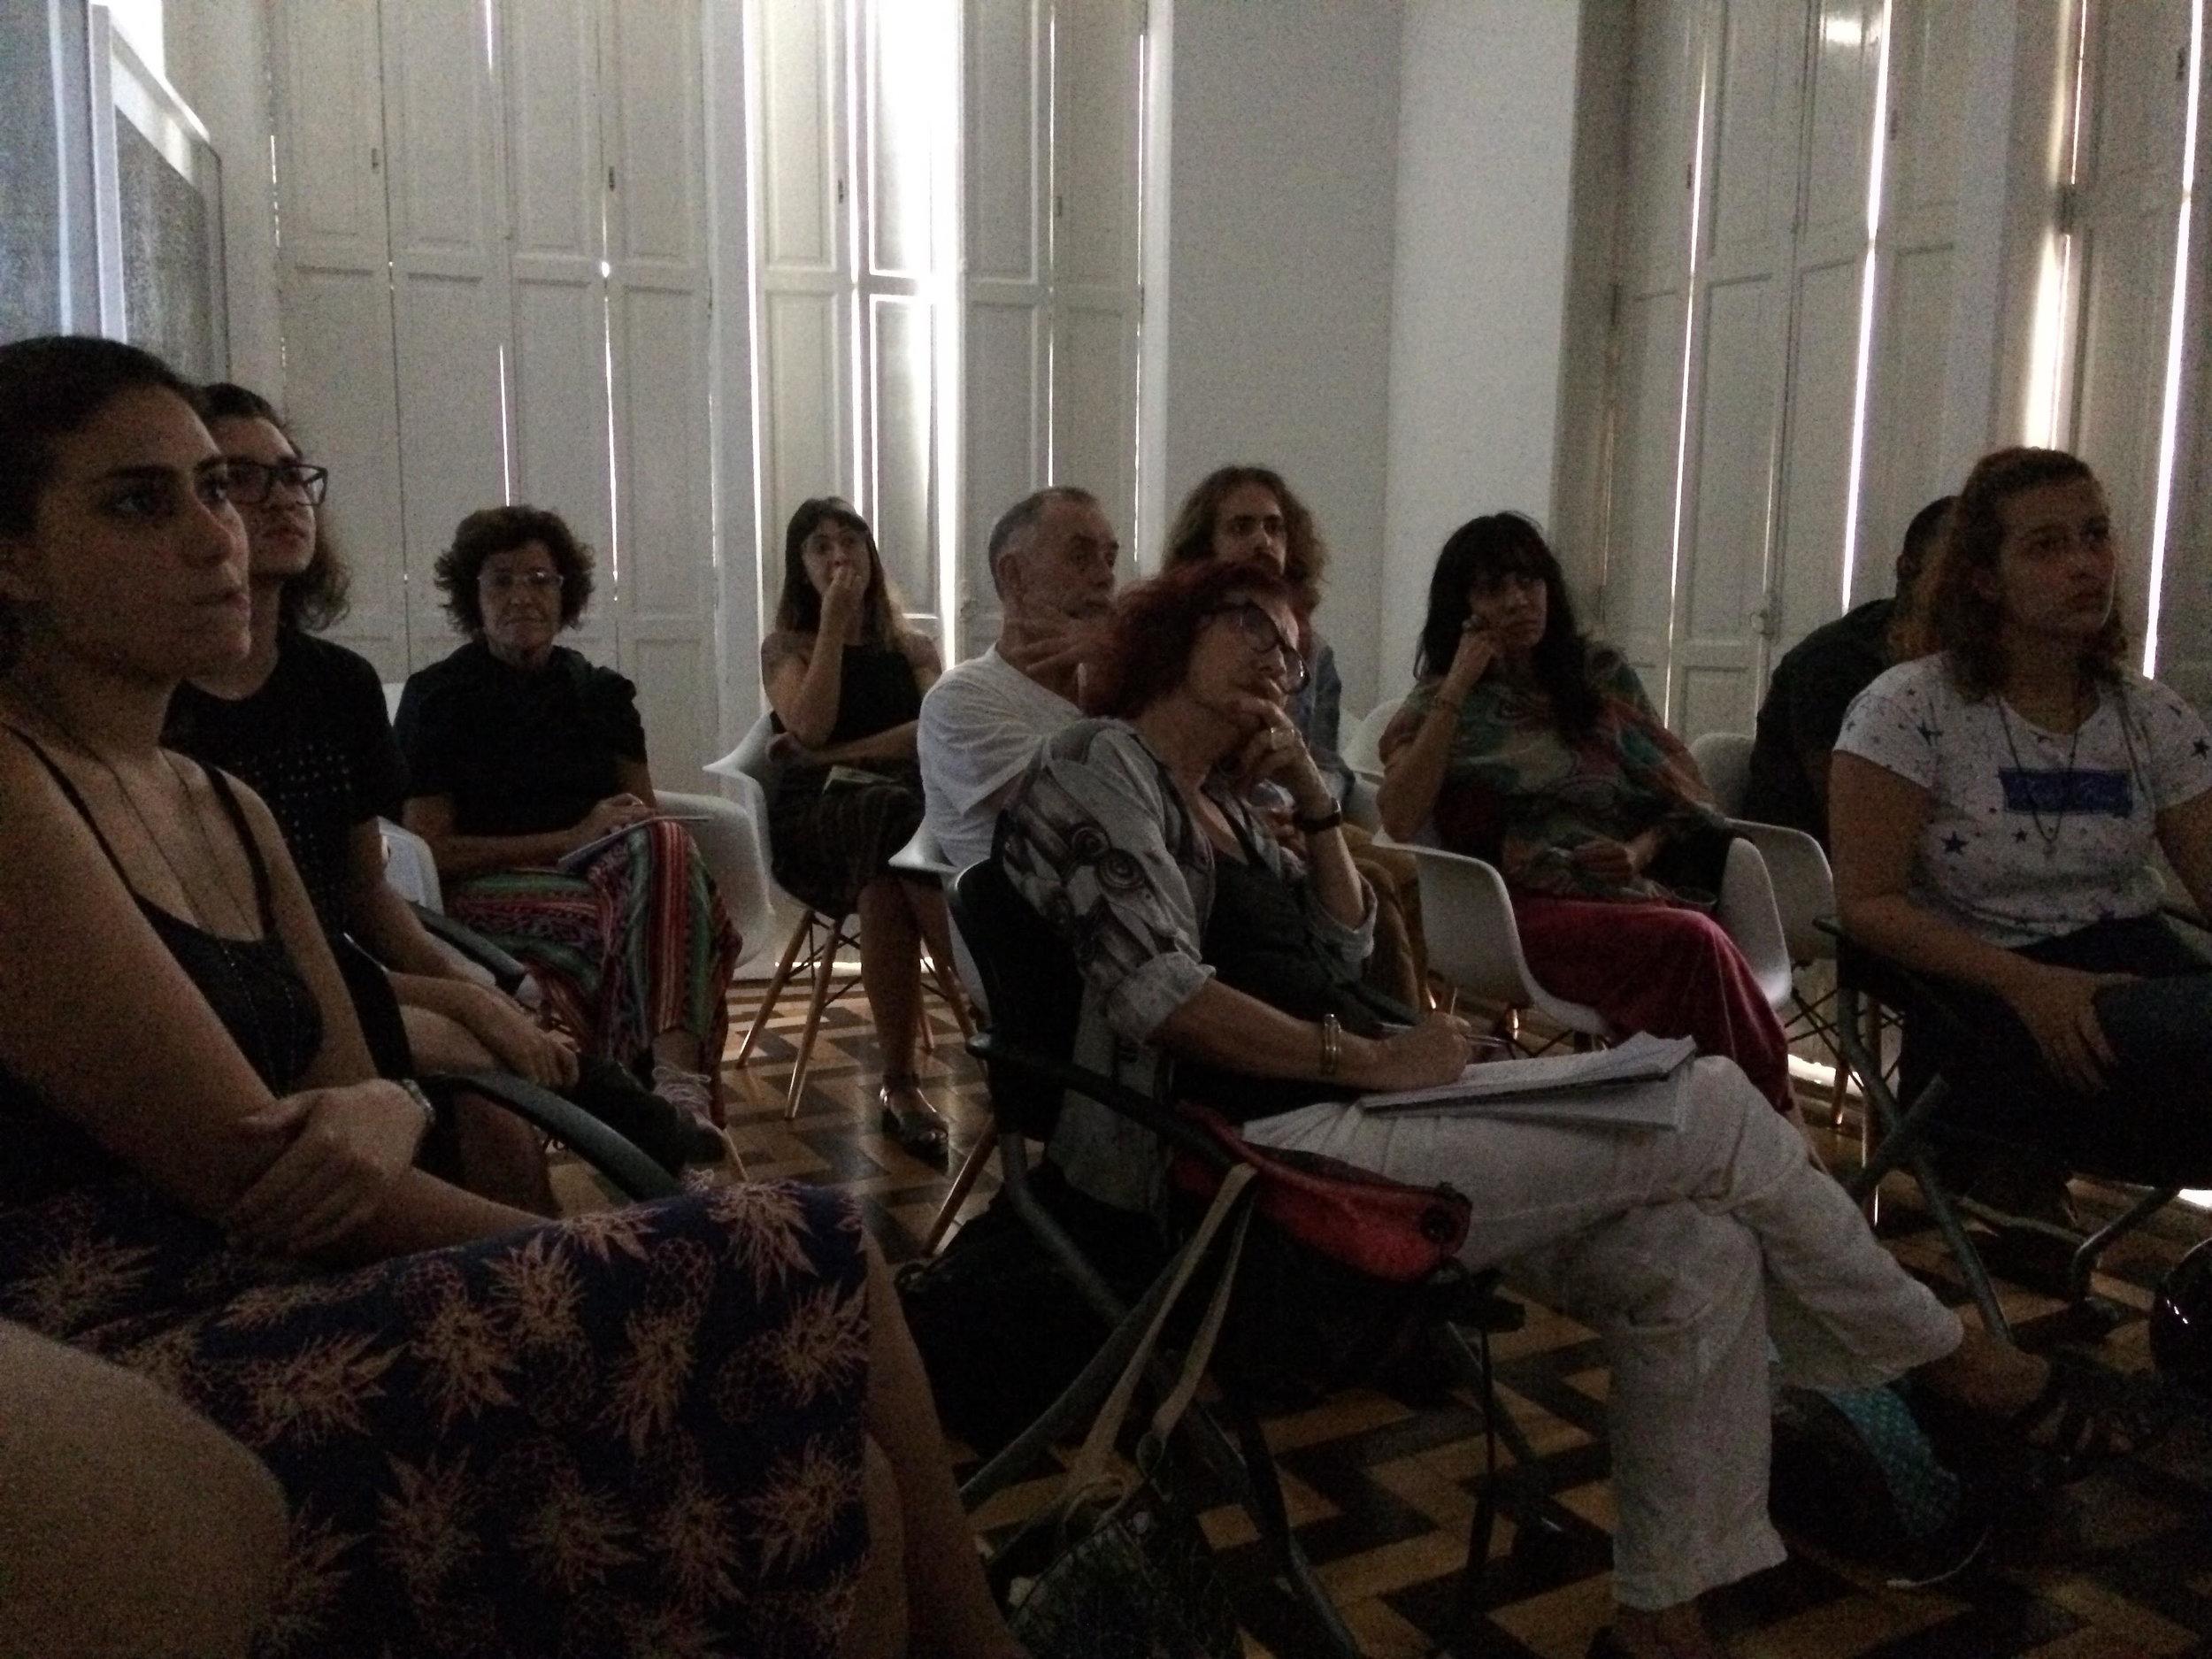 Curso Práticas Fotográficas, c/ Ana Dalloz, Kitty Paranaguá e Paulo Marcos  7/outubro a 16/dezembro